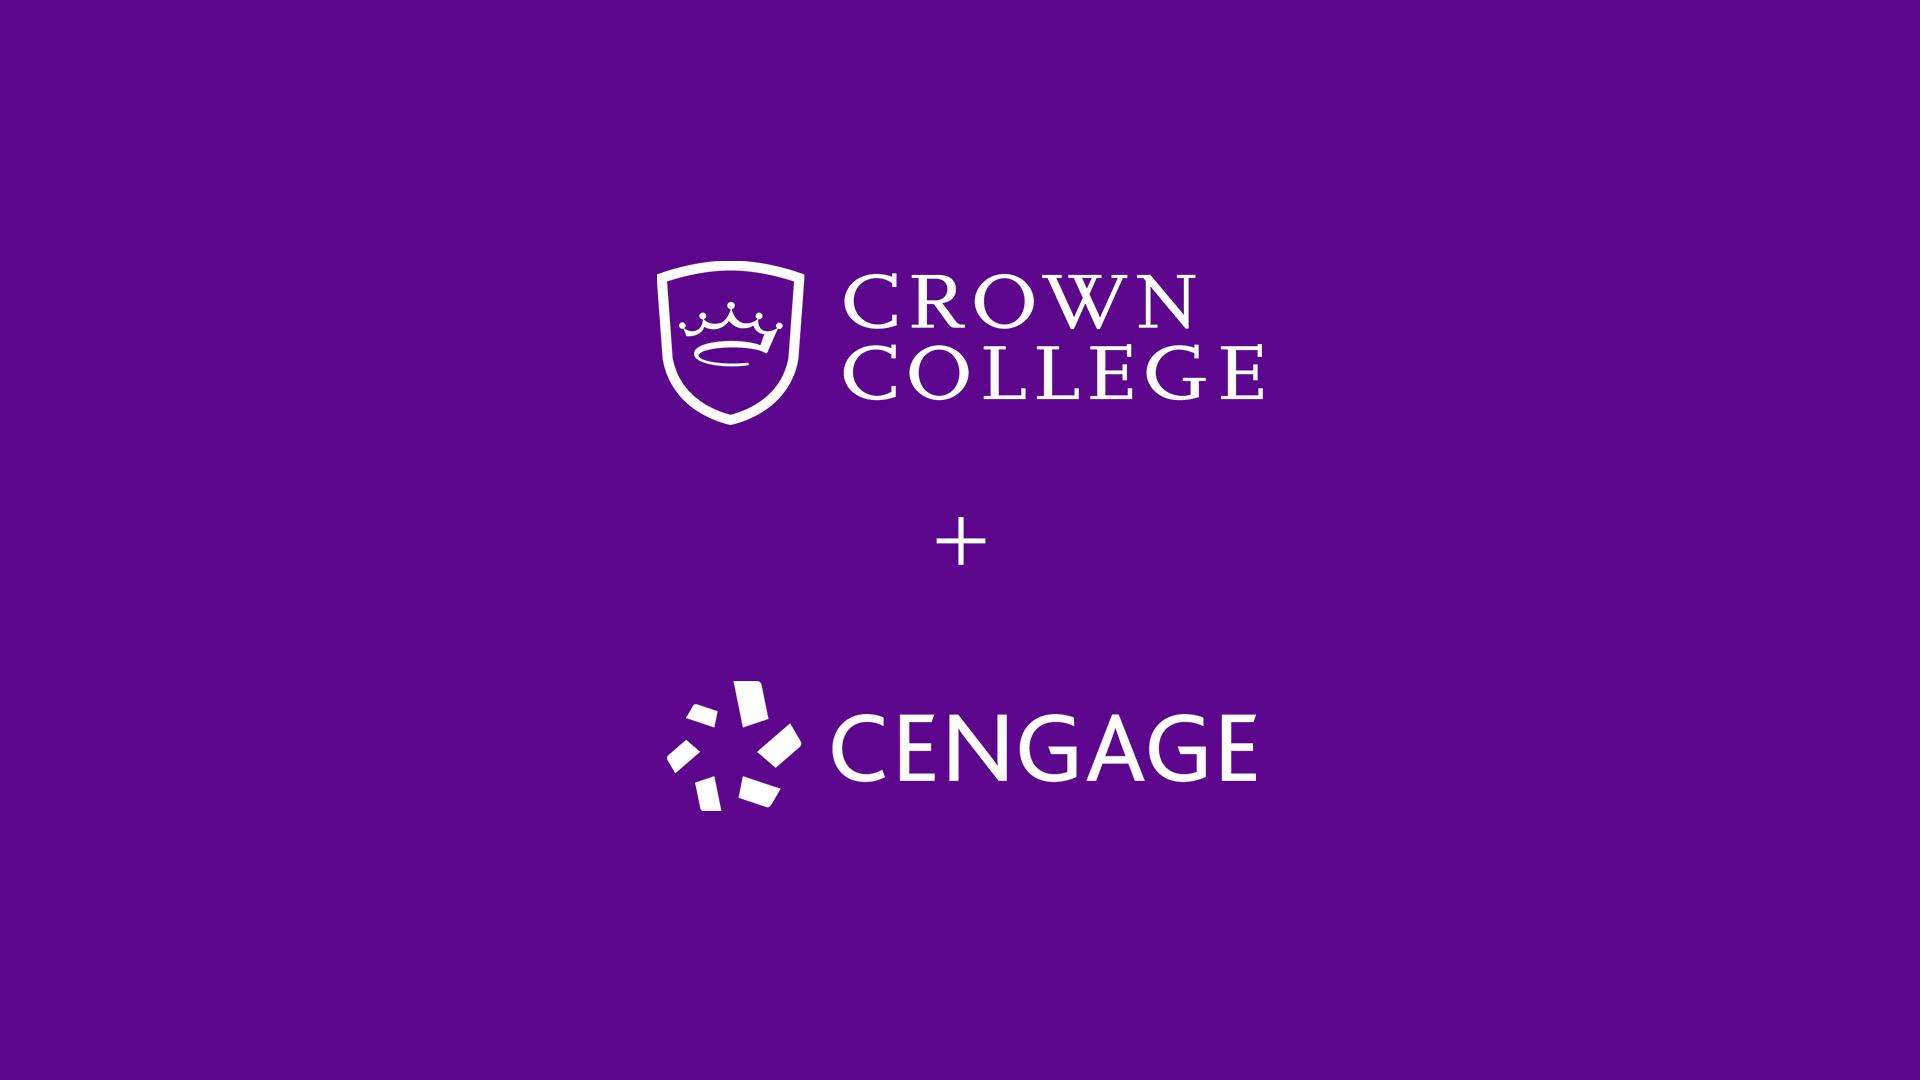 Cengage + Crown Purple